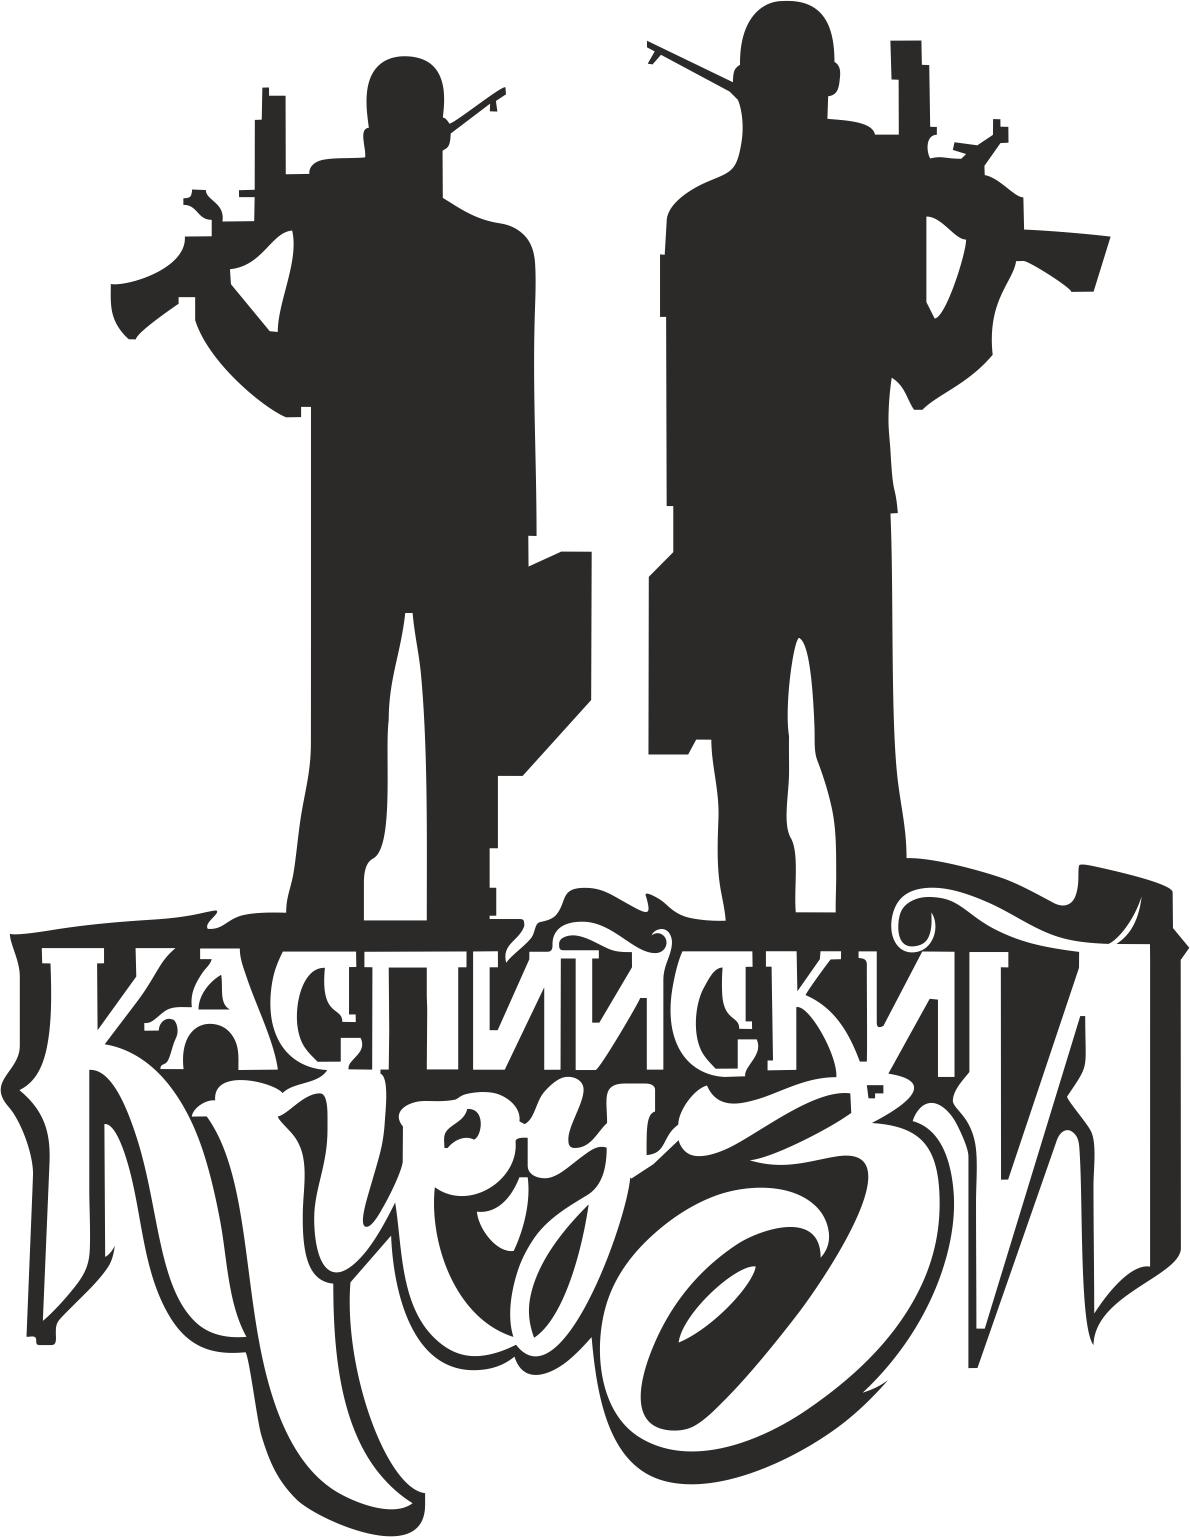 Наклейка на авто – Каспийский Груз Free CDR Vectors Art